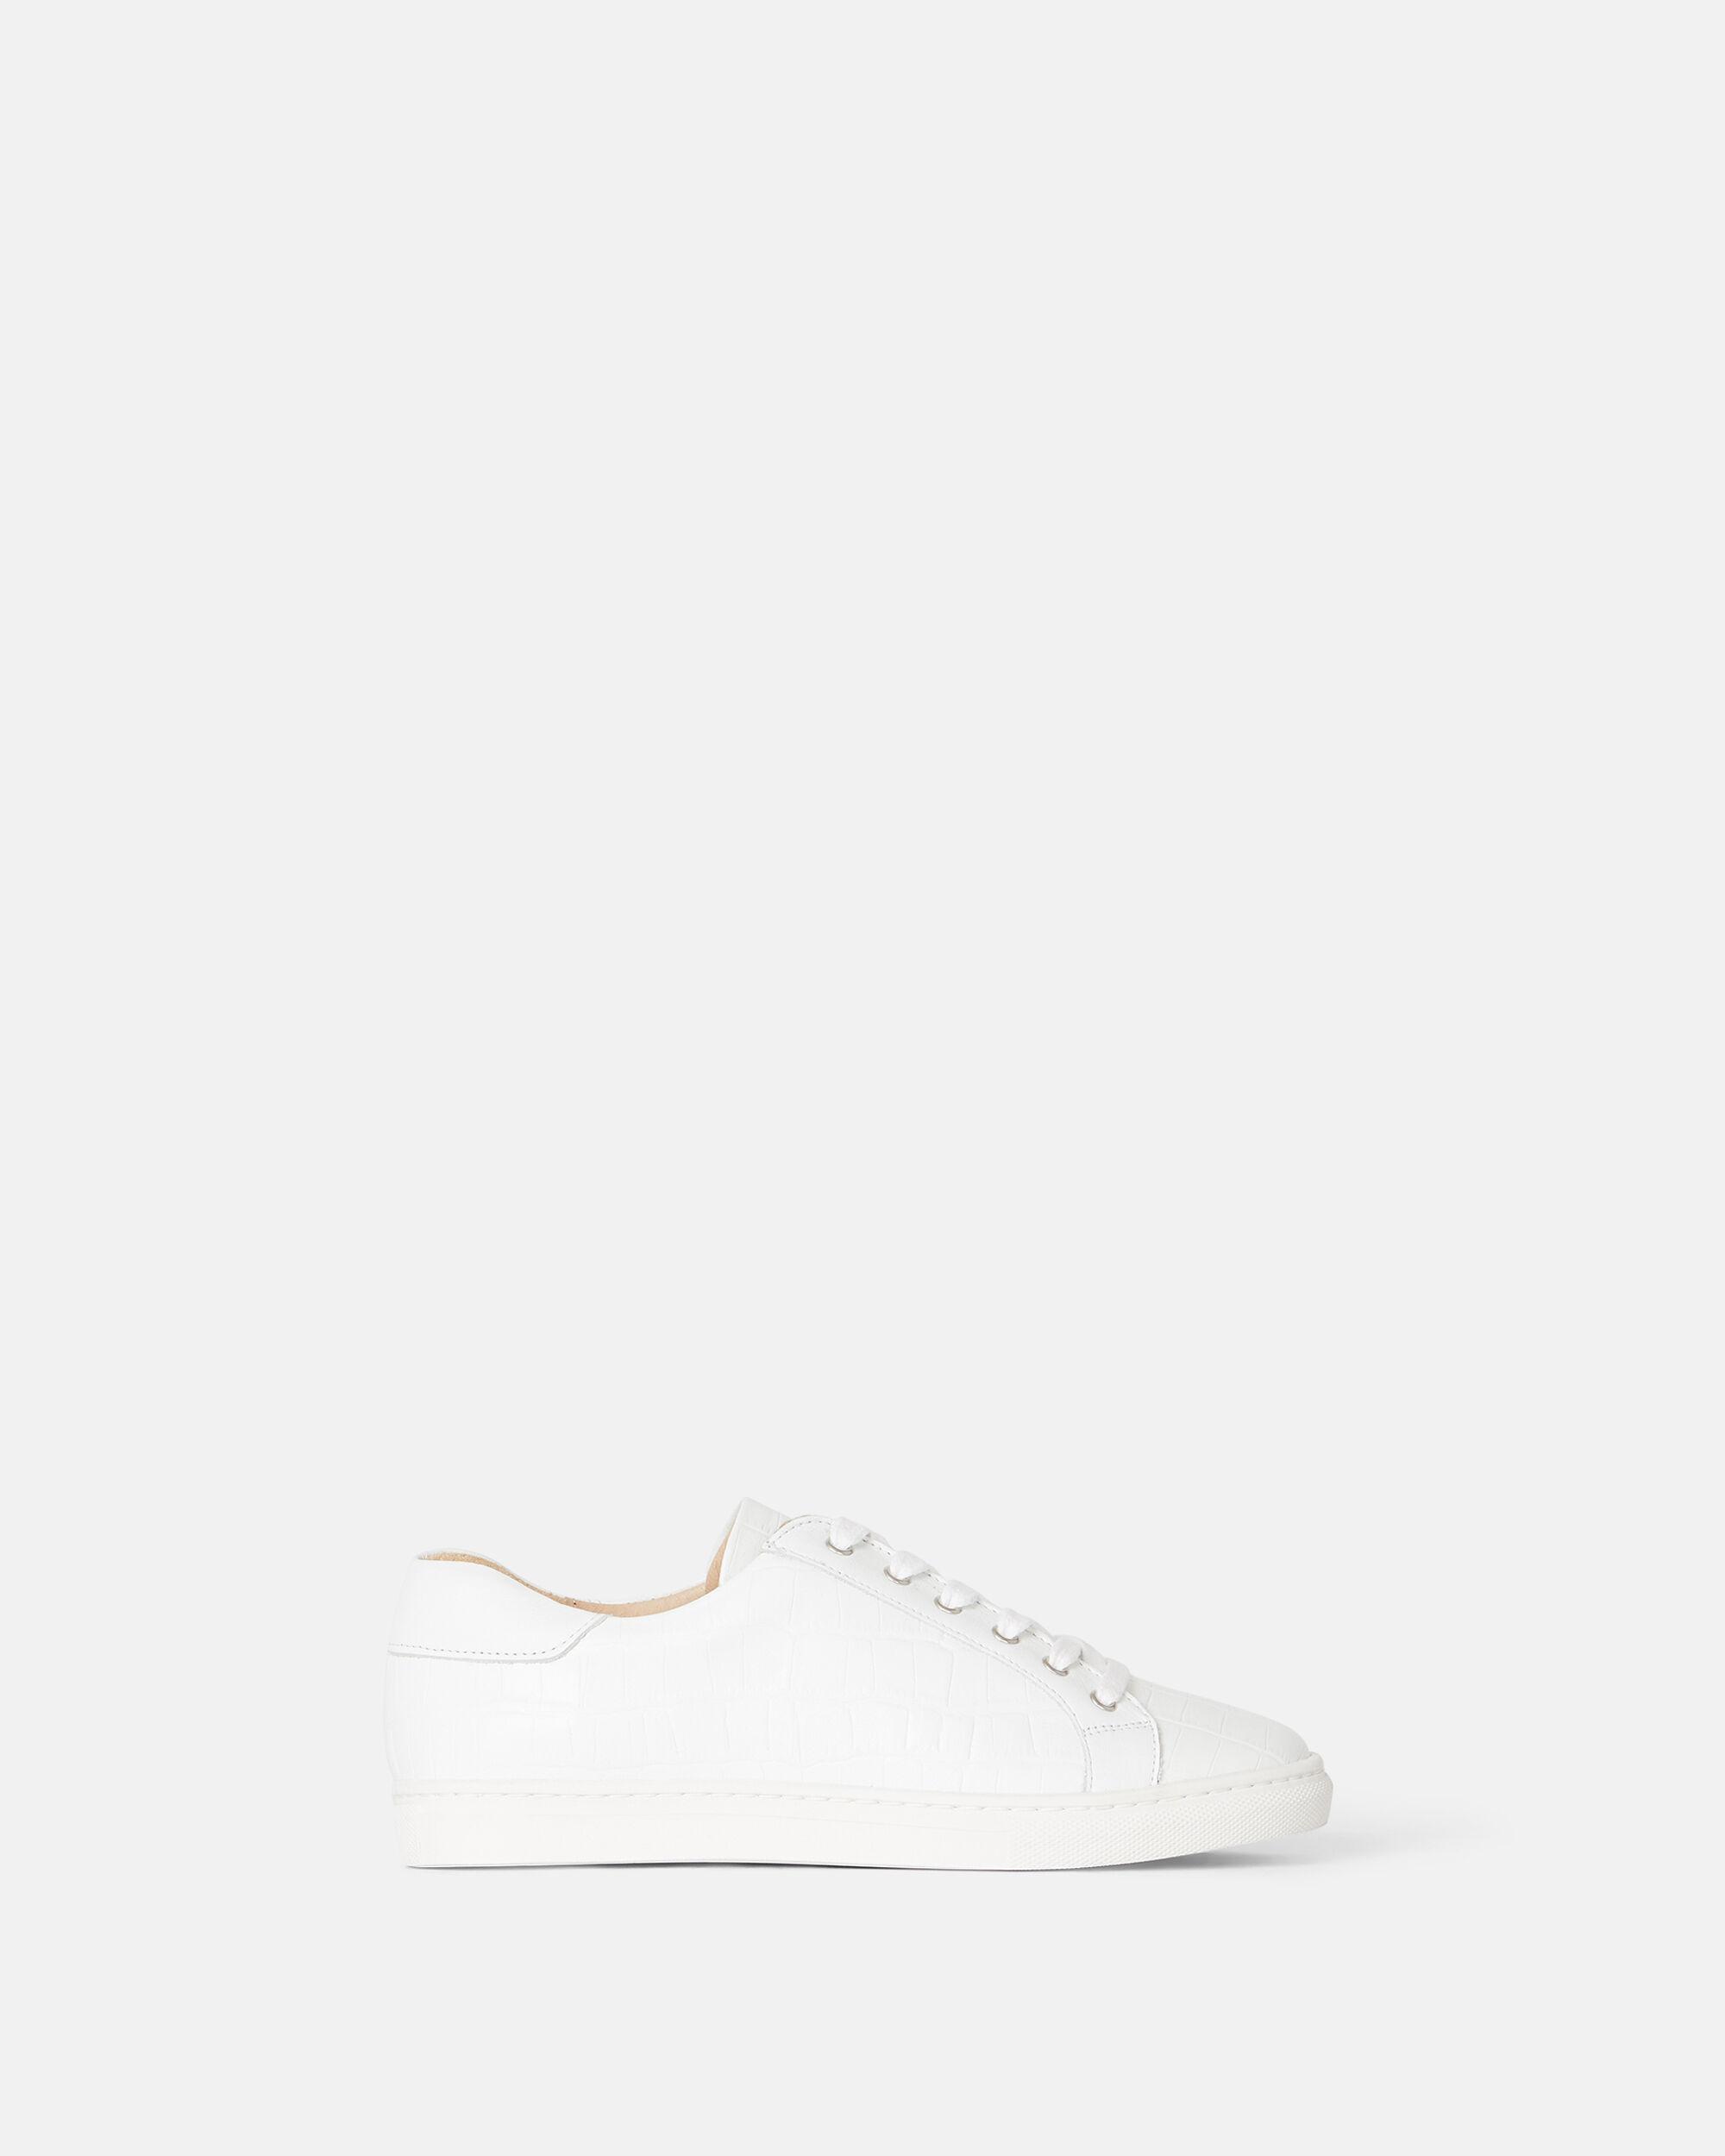 magasin chaussure minelli nantes,chaussures minelli sarenza